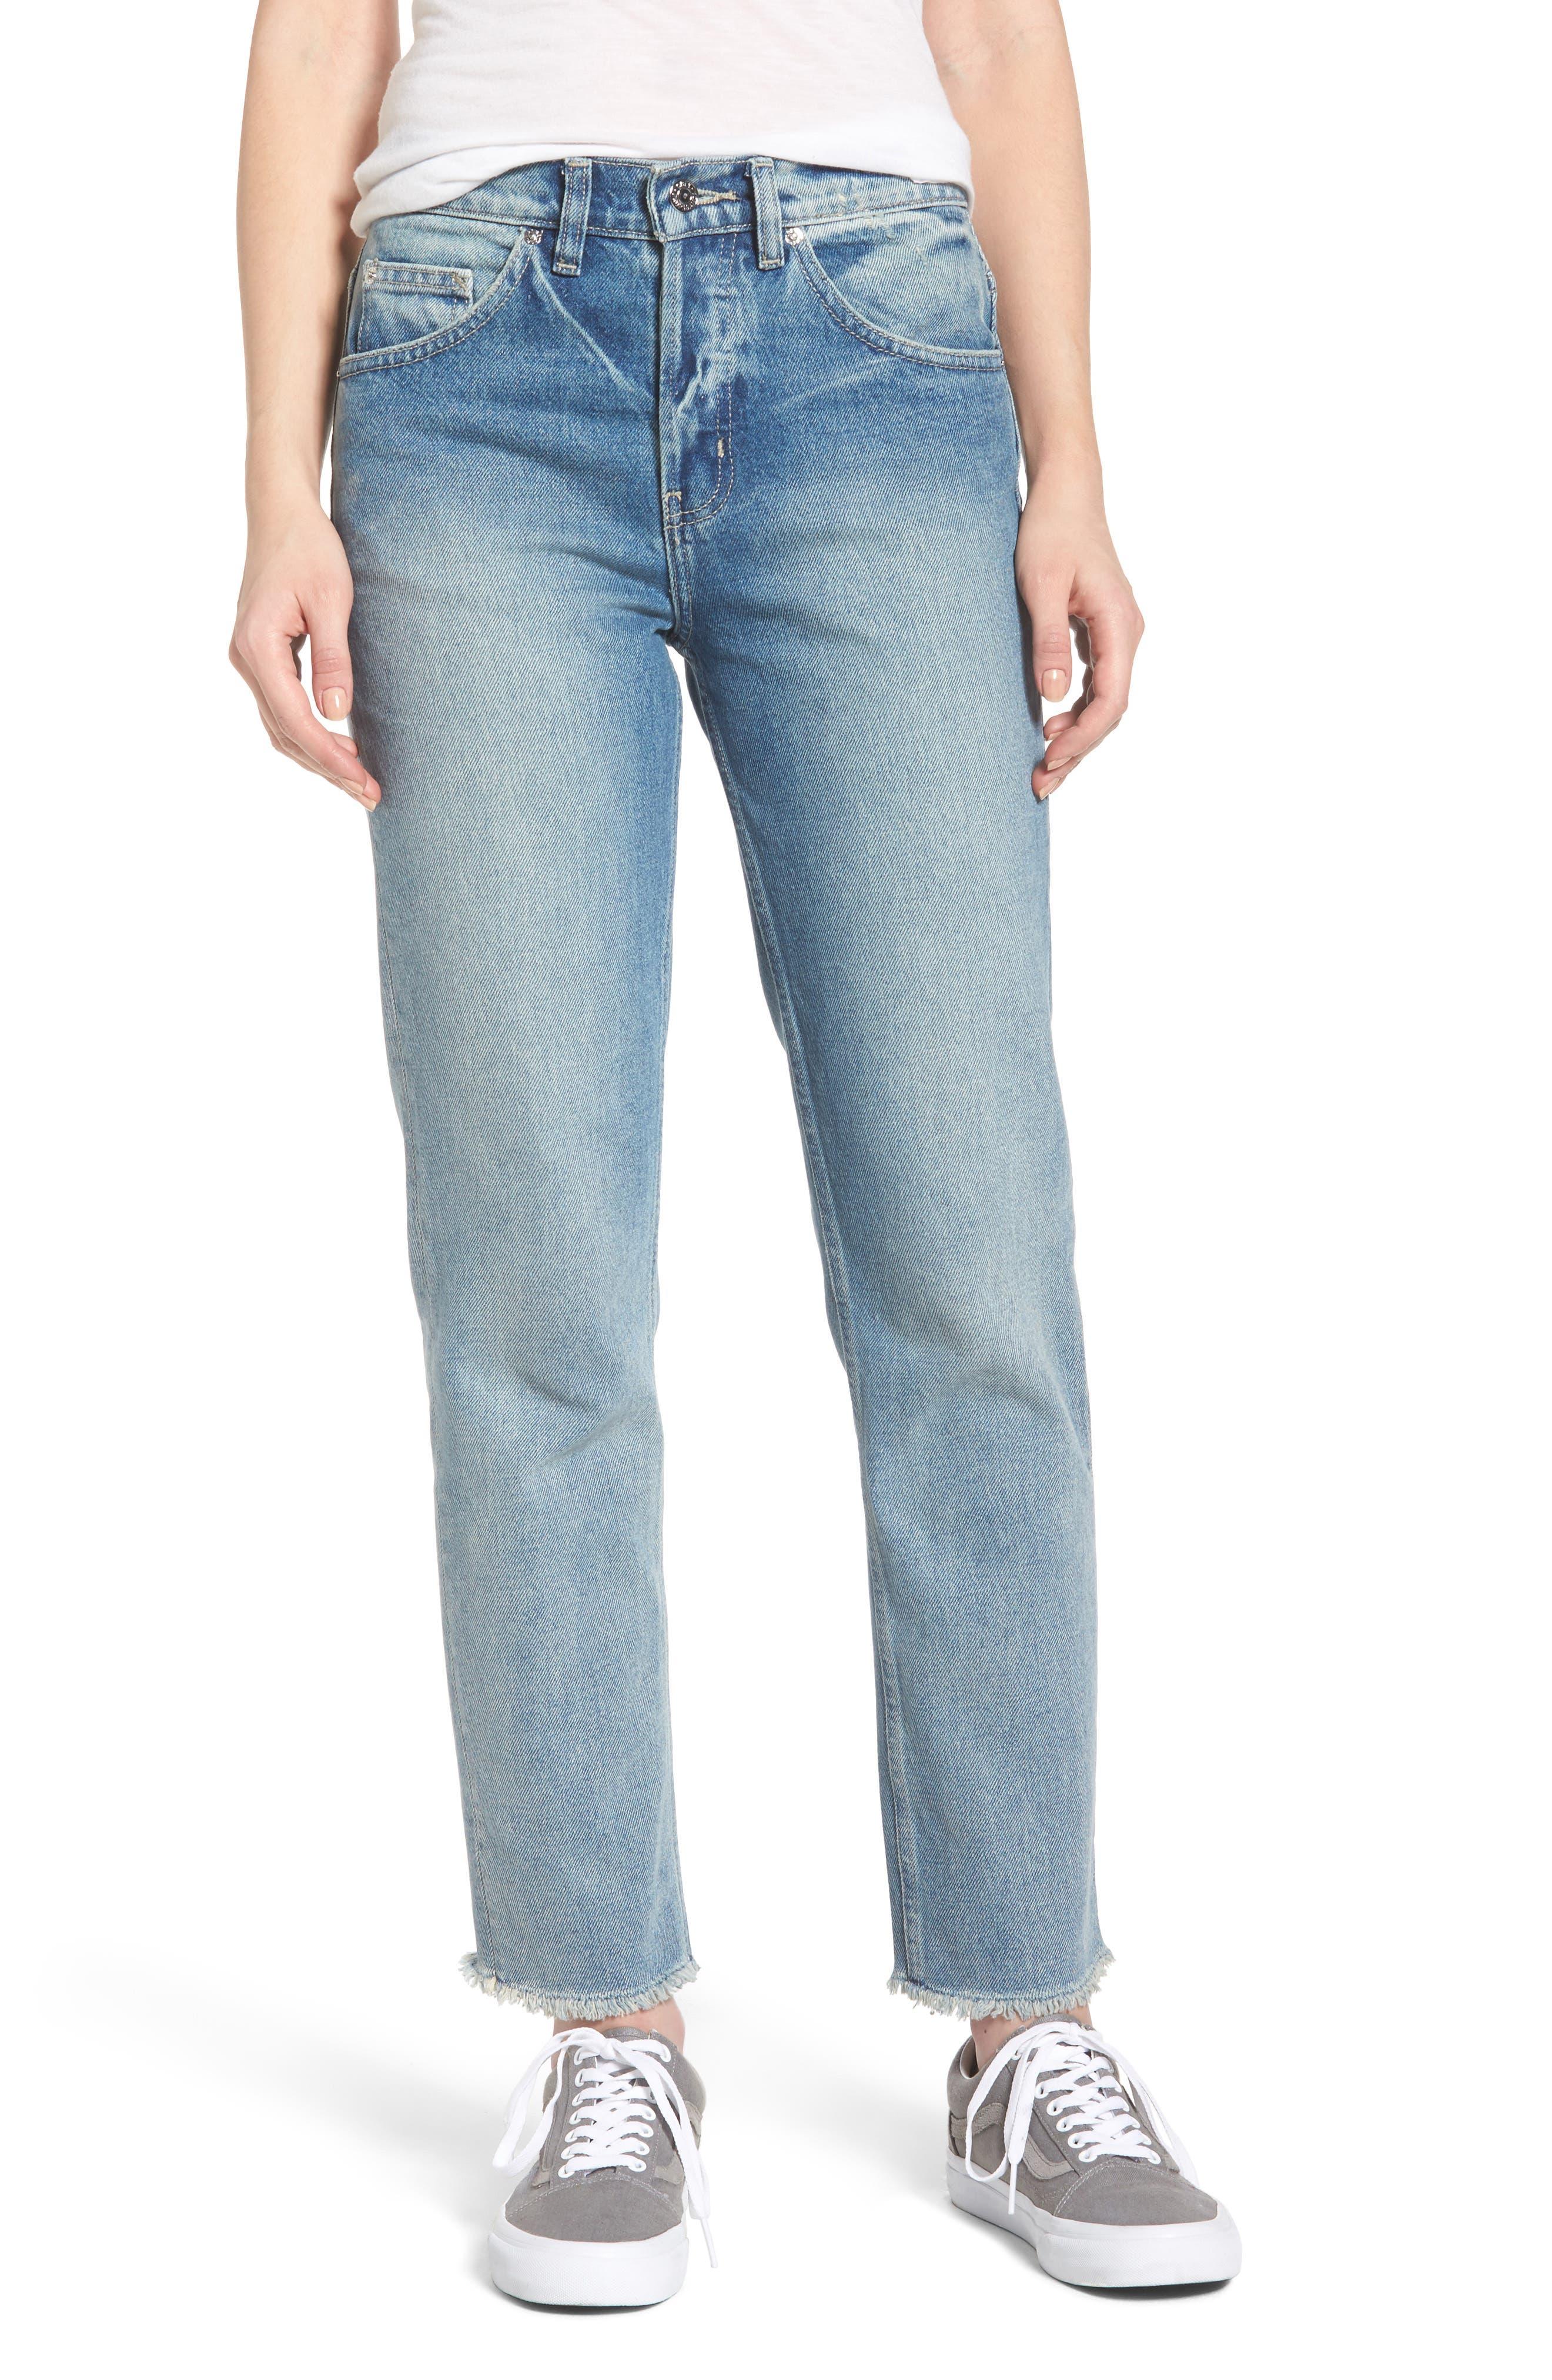 Sundays Straggler High Waist Jeans,                         Main,                         color, Bleached Indigo